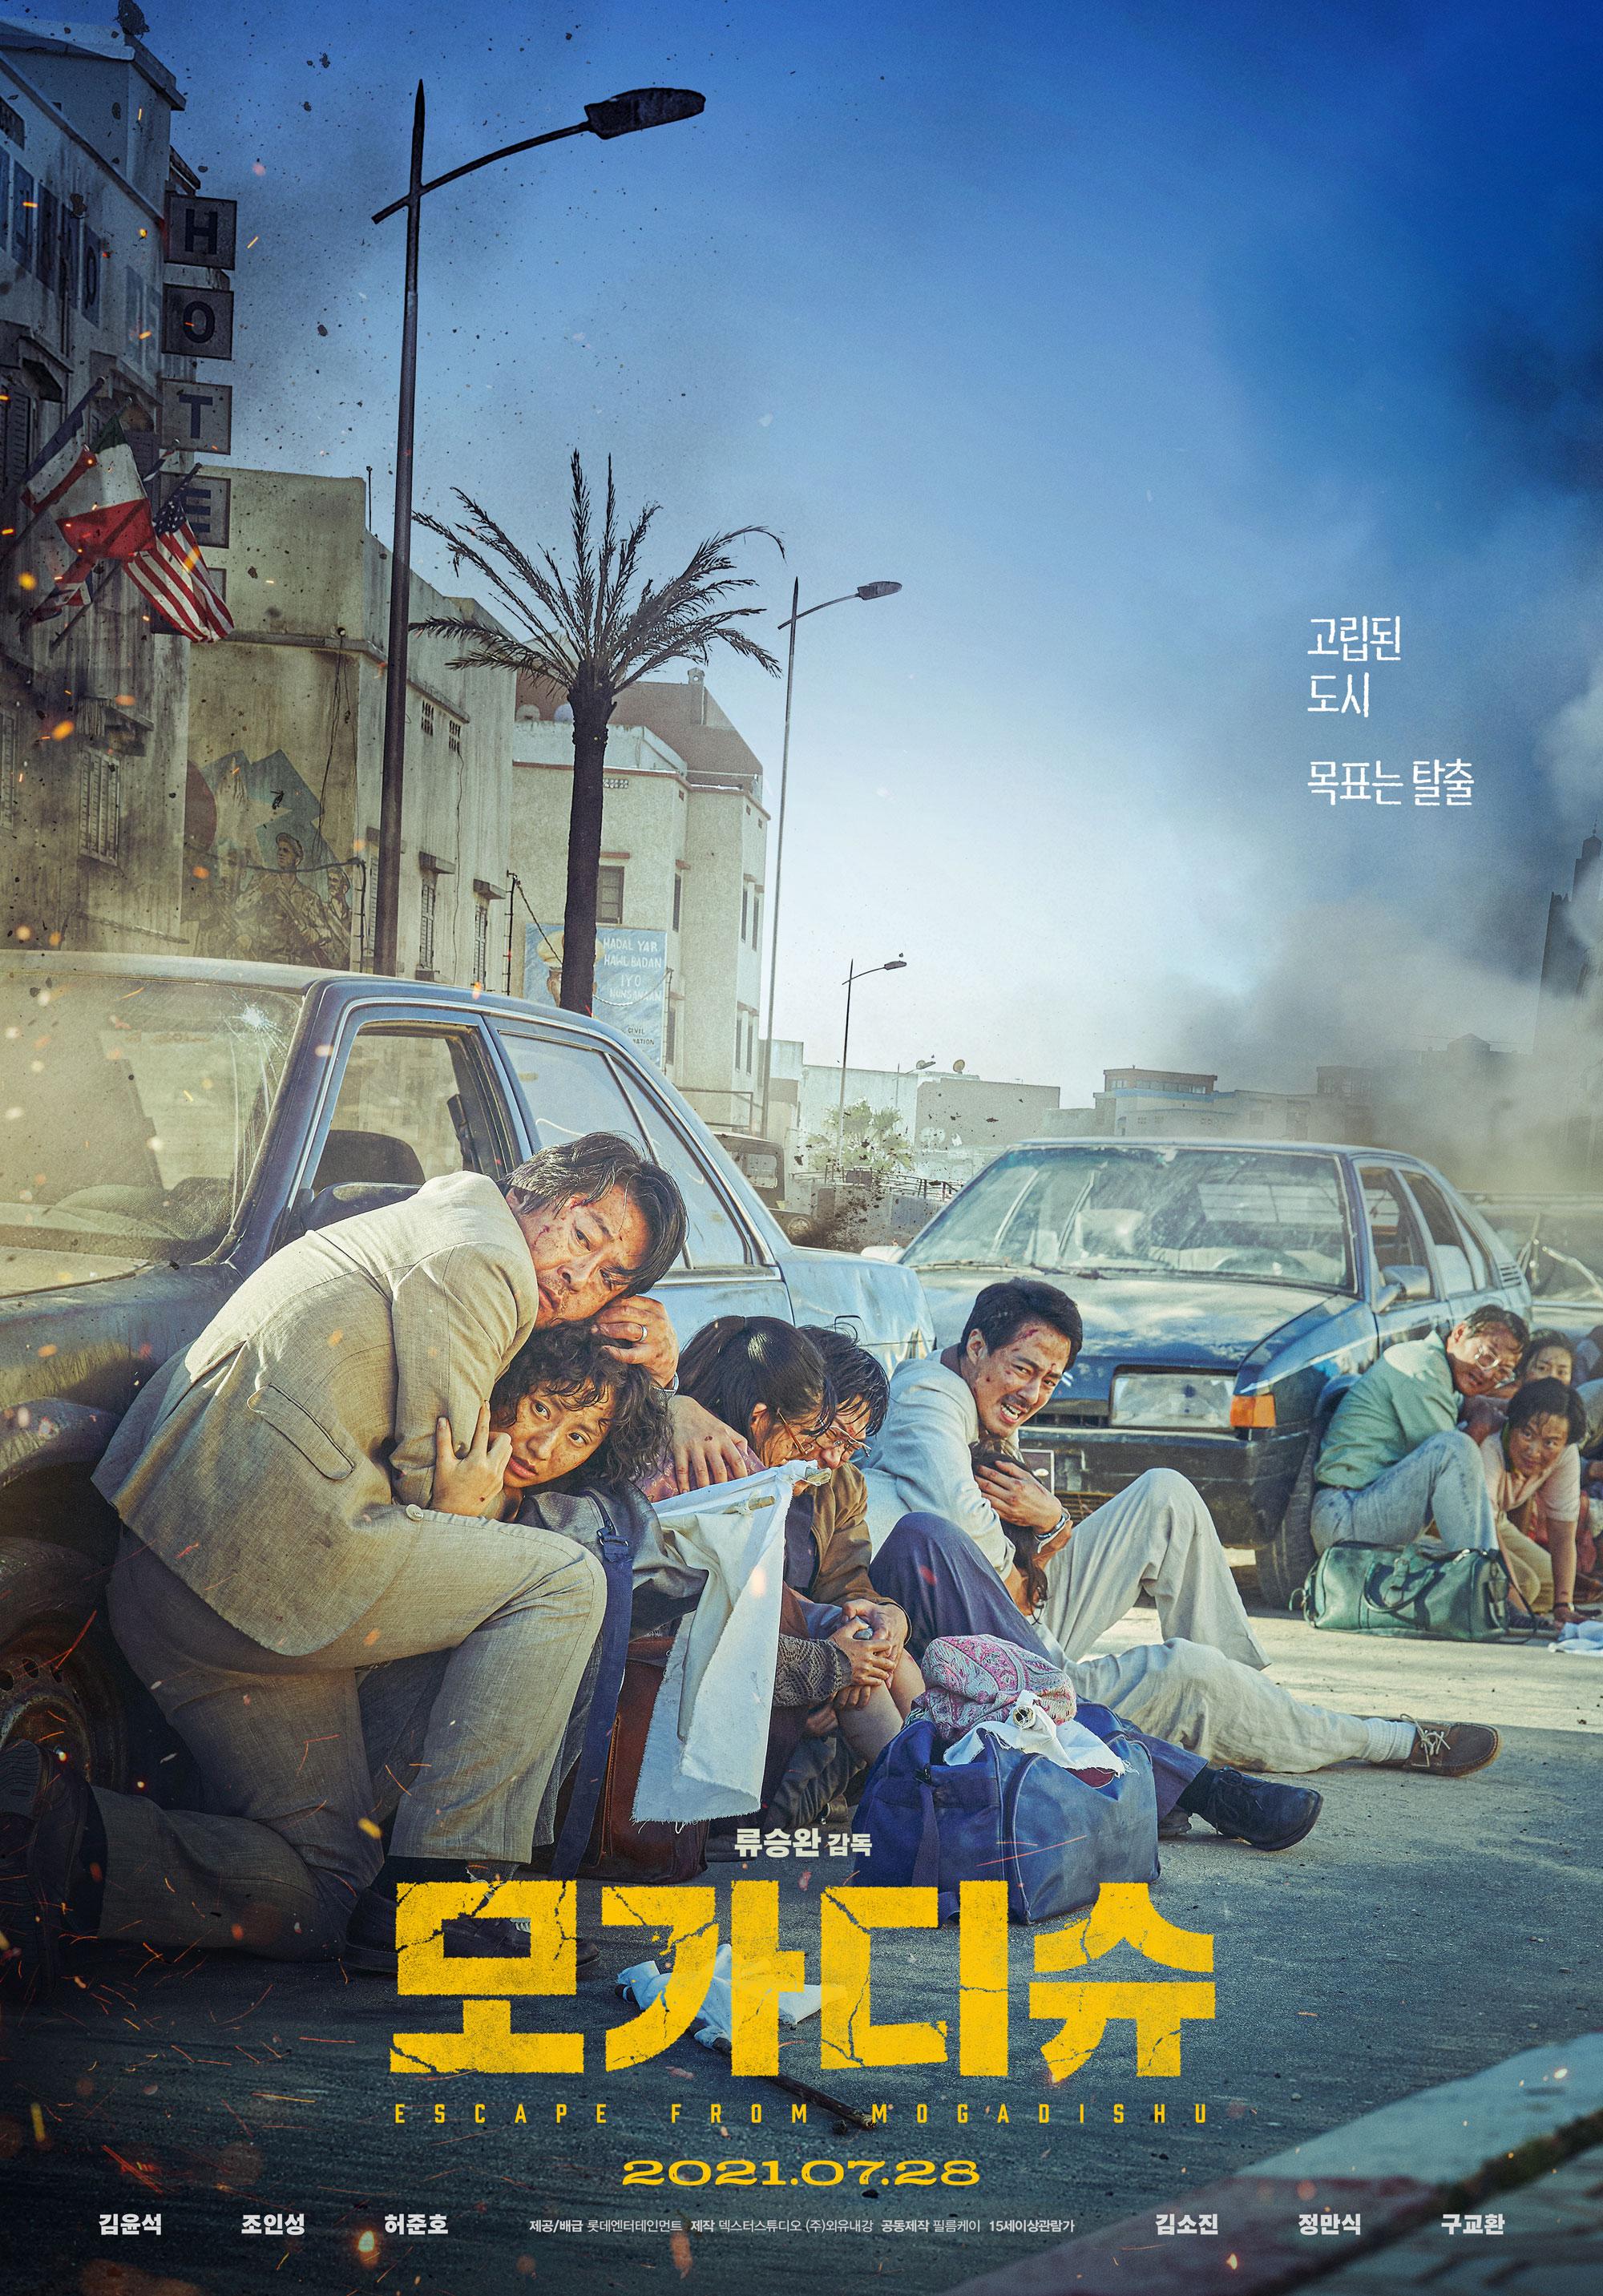 Escape from Mogadishu (Mogadishu / 모가디슈) Subtitle Indonesia